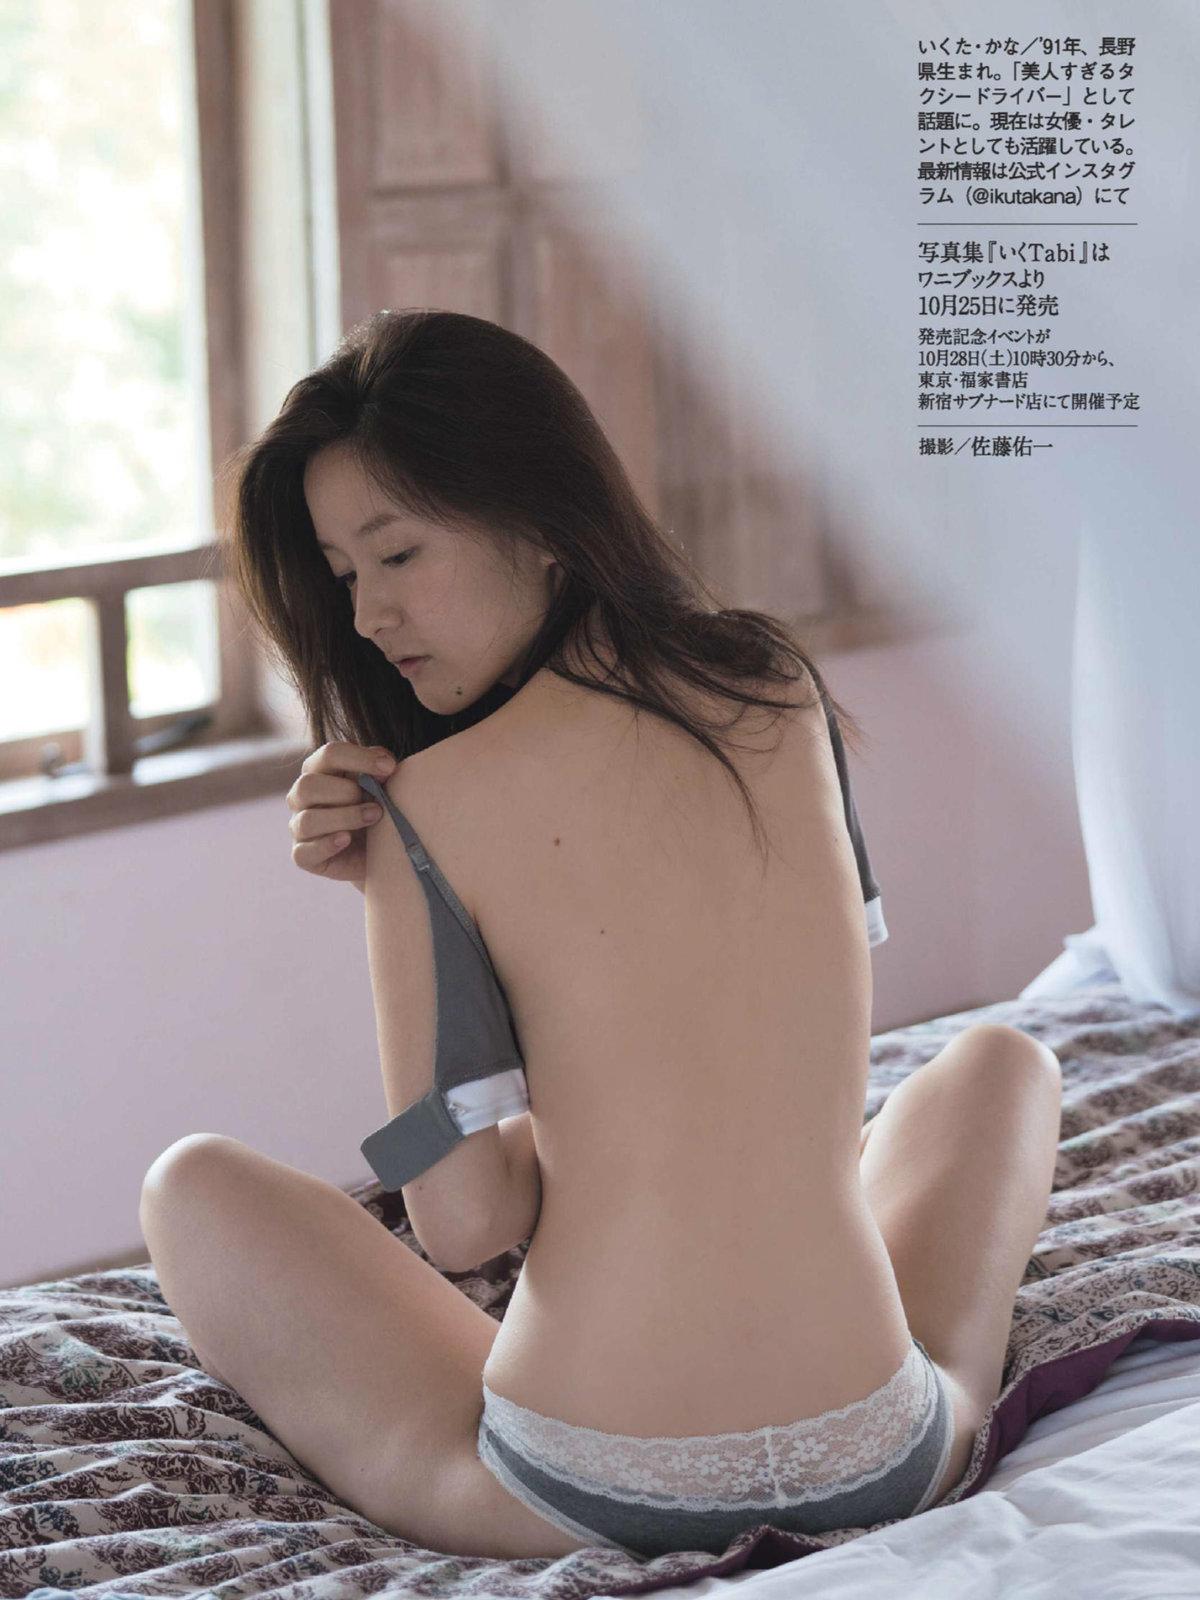 Kana Ikuta 生田佳那, Shukan Gendai 2017.11.04 (週刊現代 2017年11月04日号)